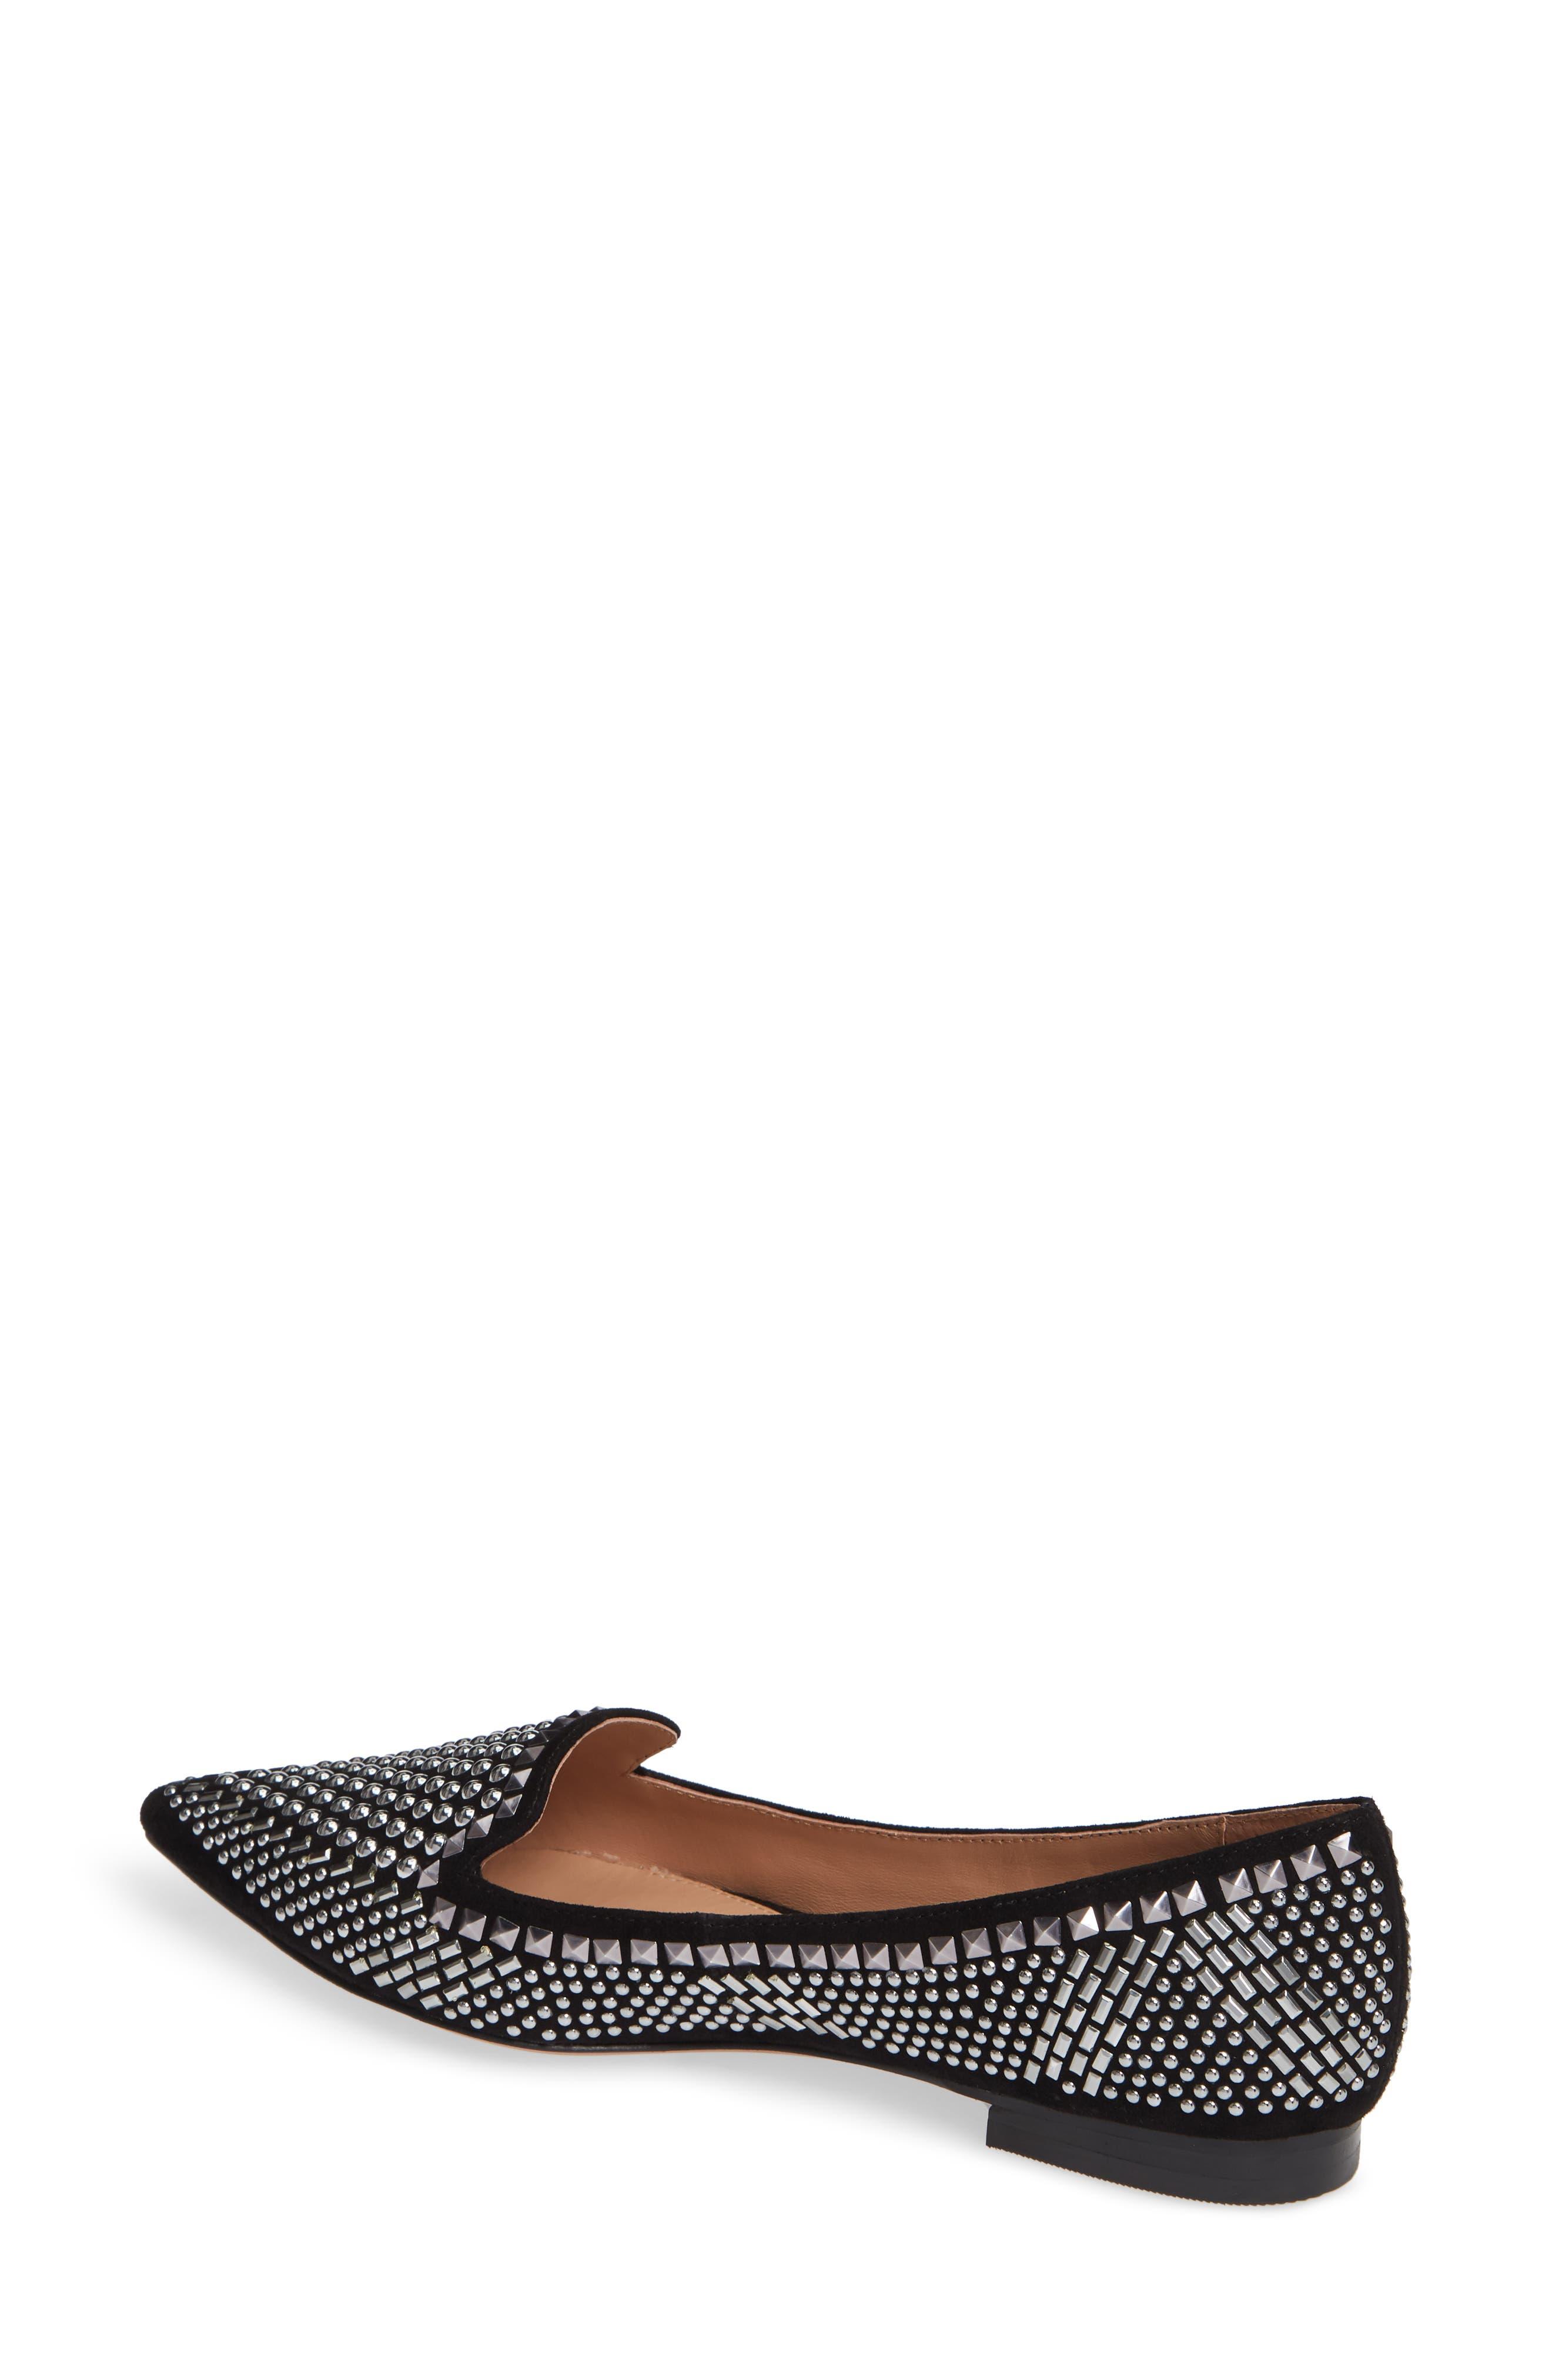 Portia Studded Loafer,                             Alternate thumbnail 2, color,                             BLACK SUEDE